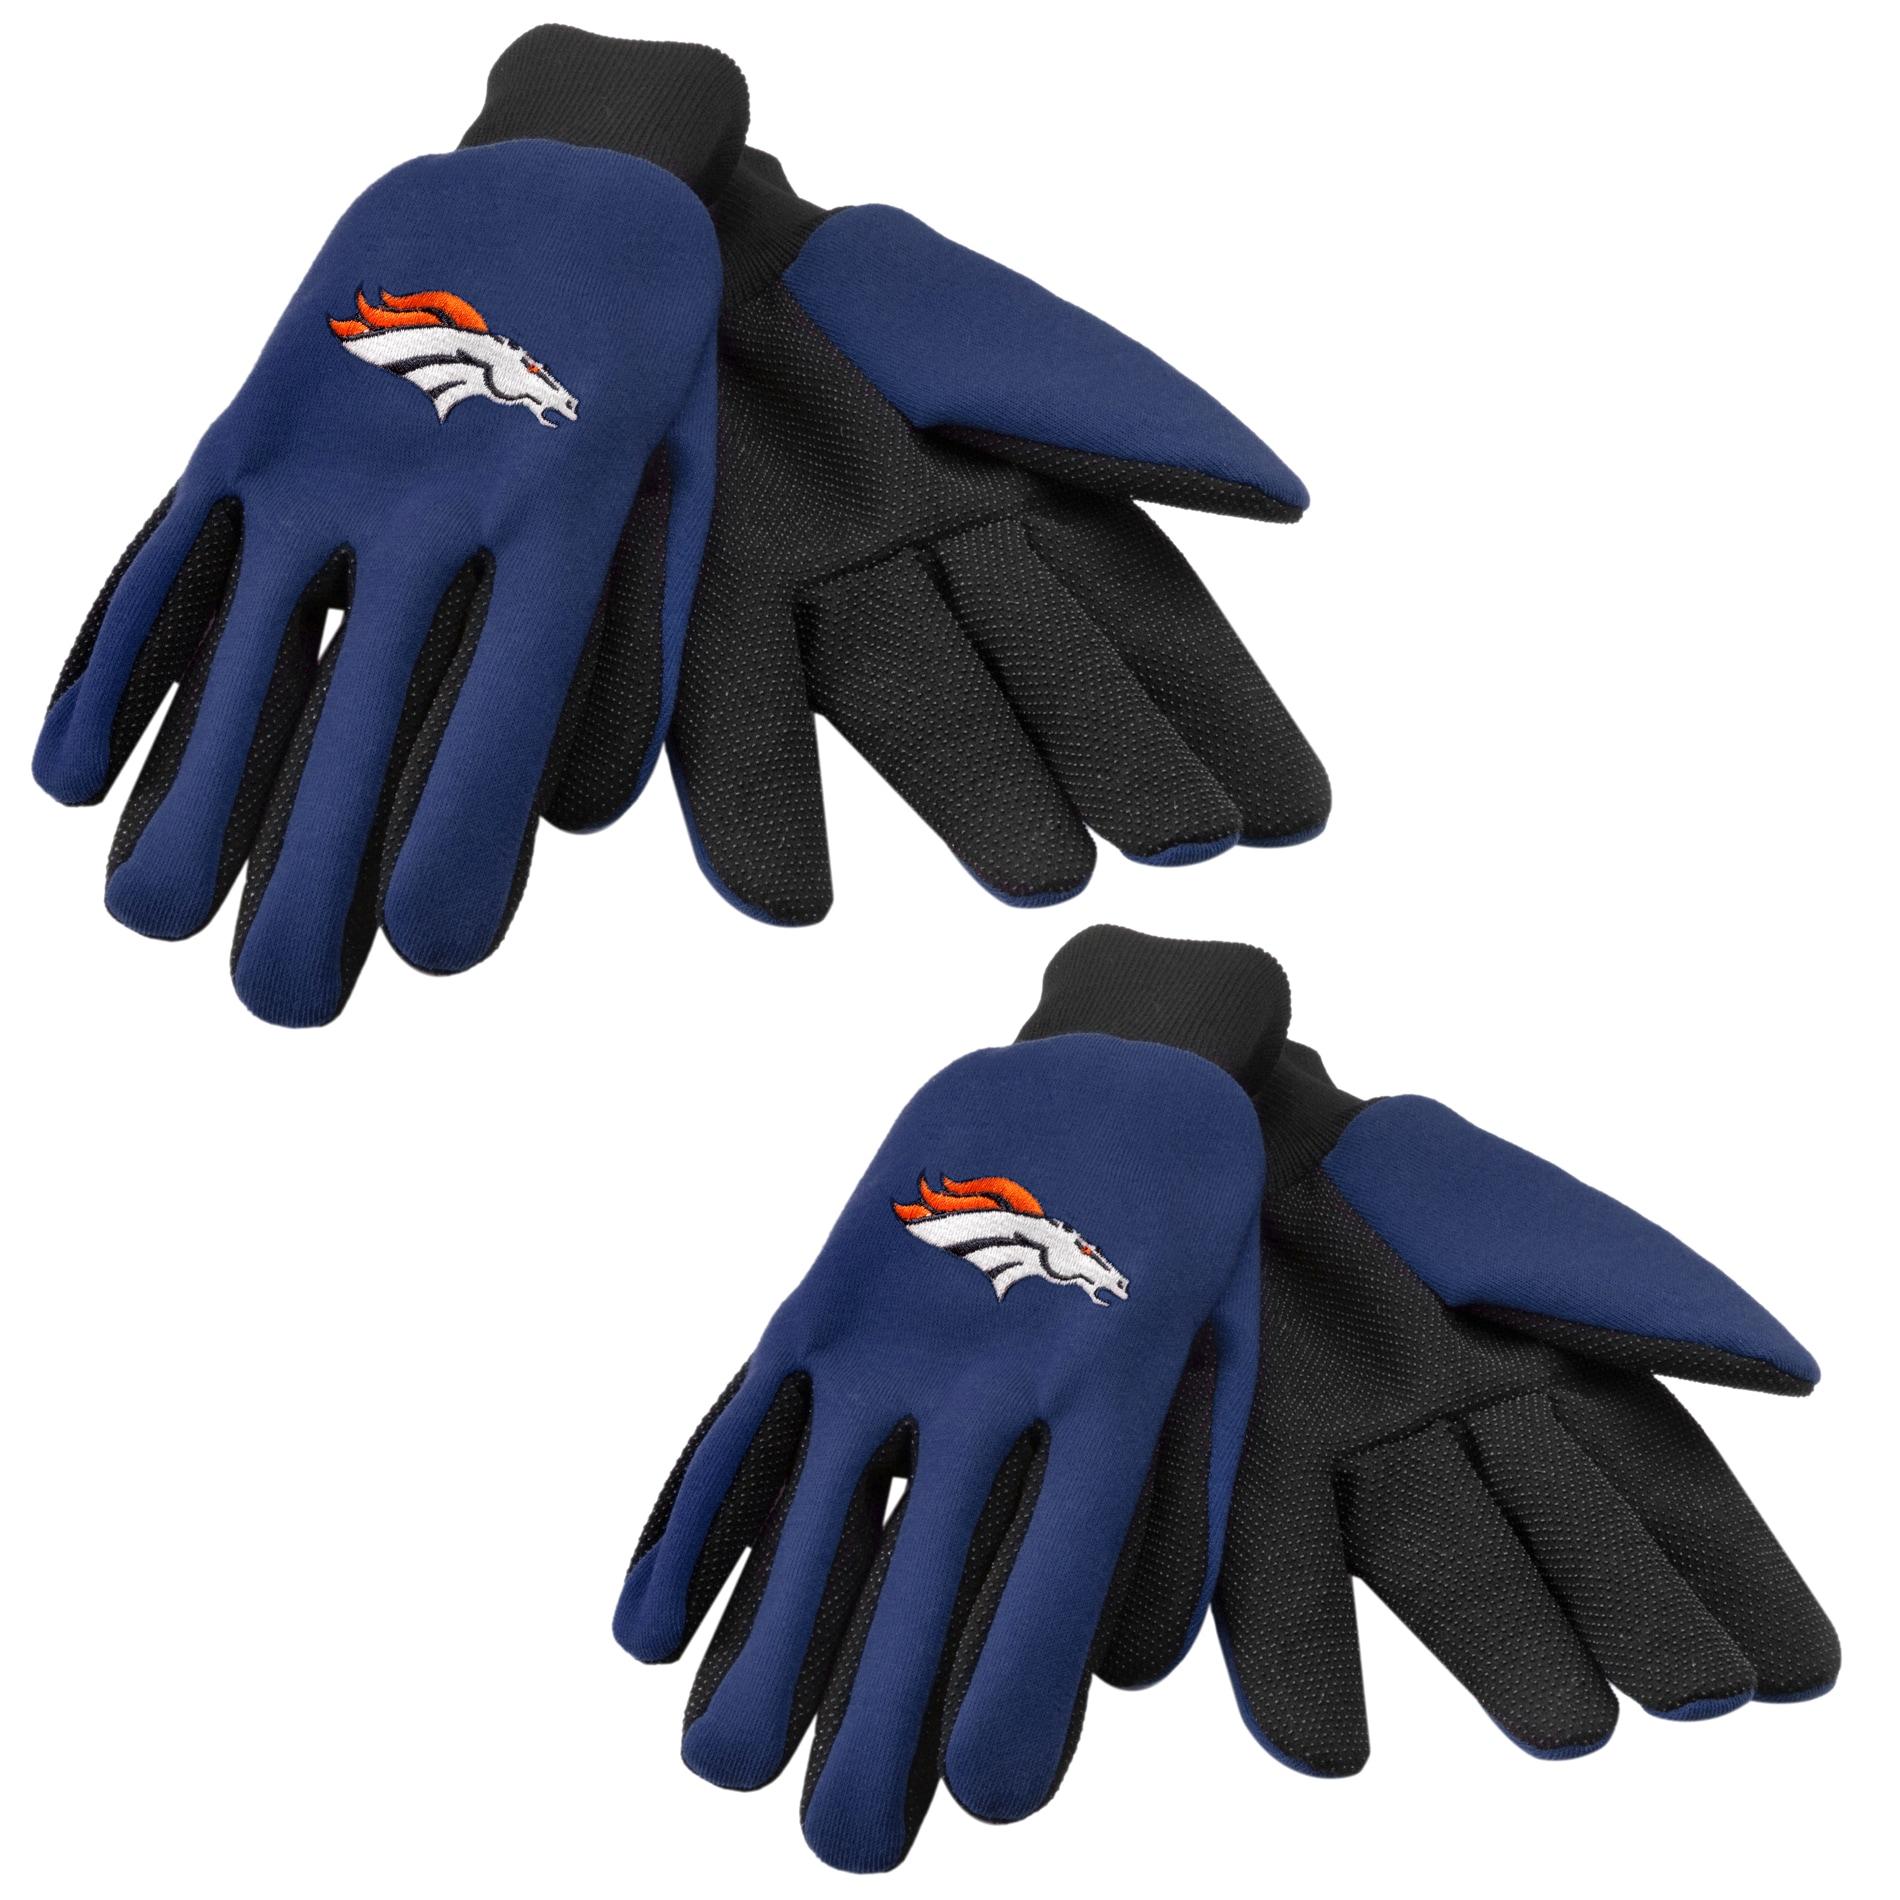 Denver Broncos Two-tone Work Gloves (Set of 2 Pair)